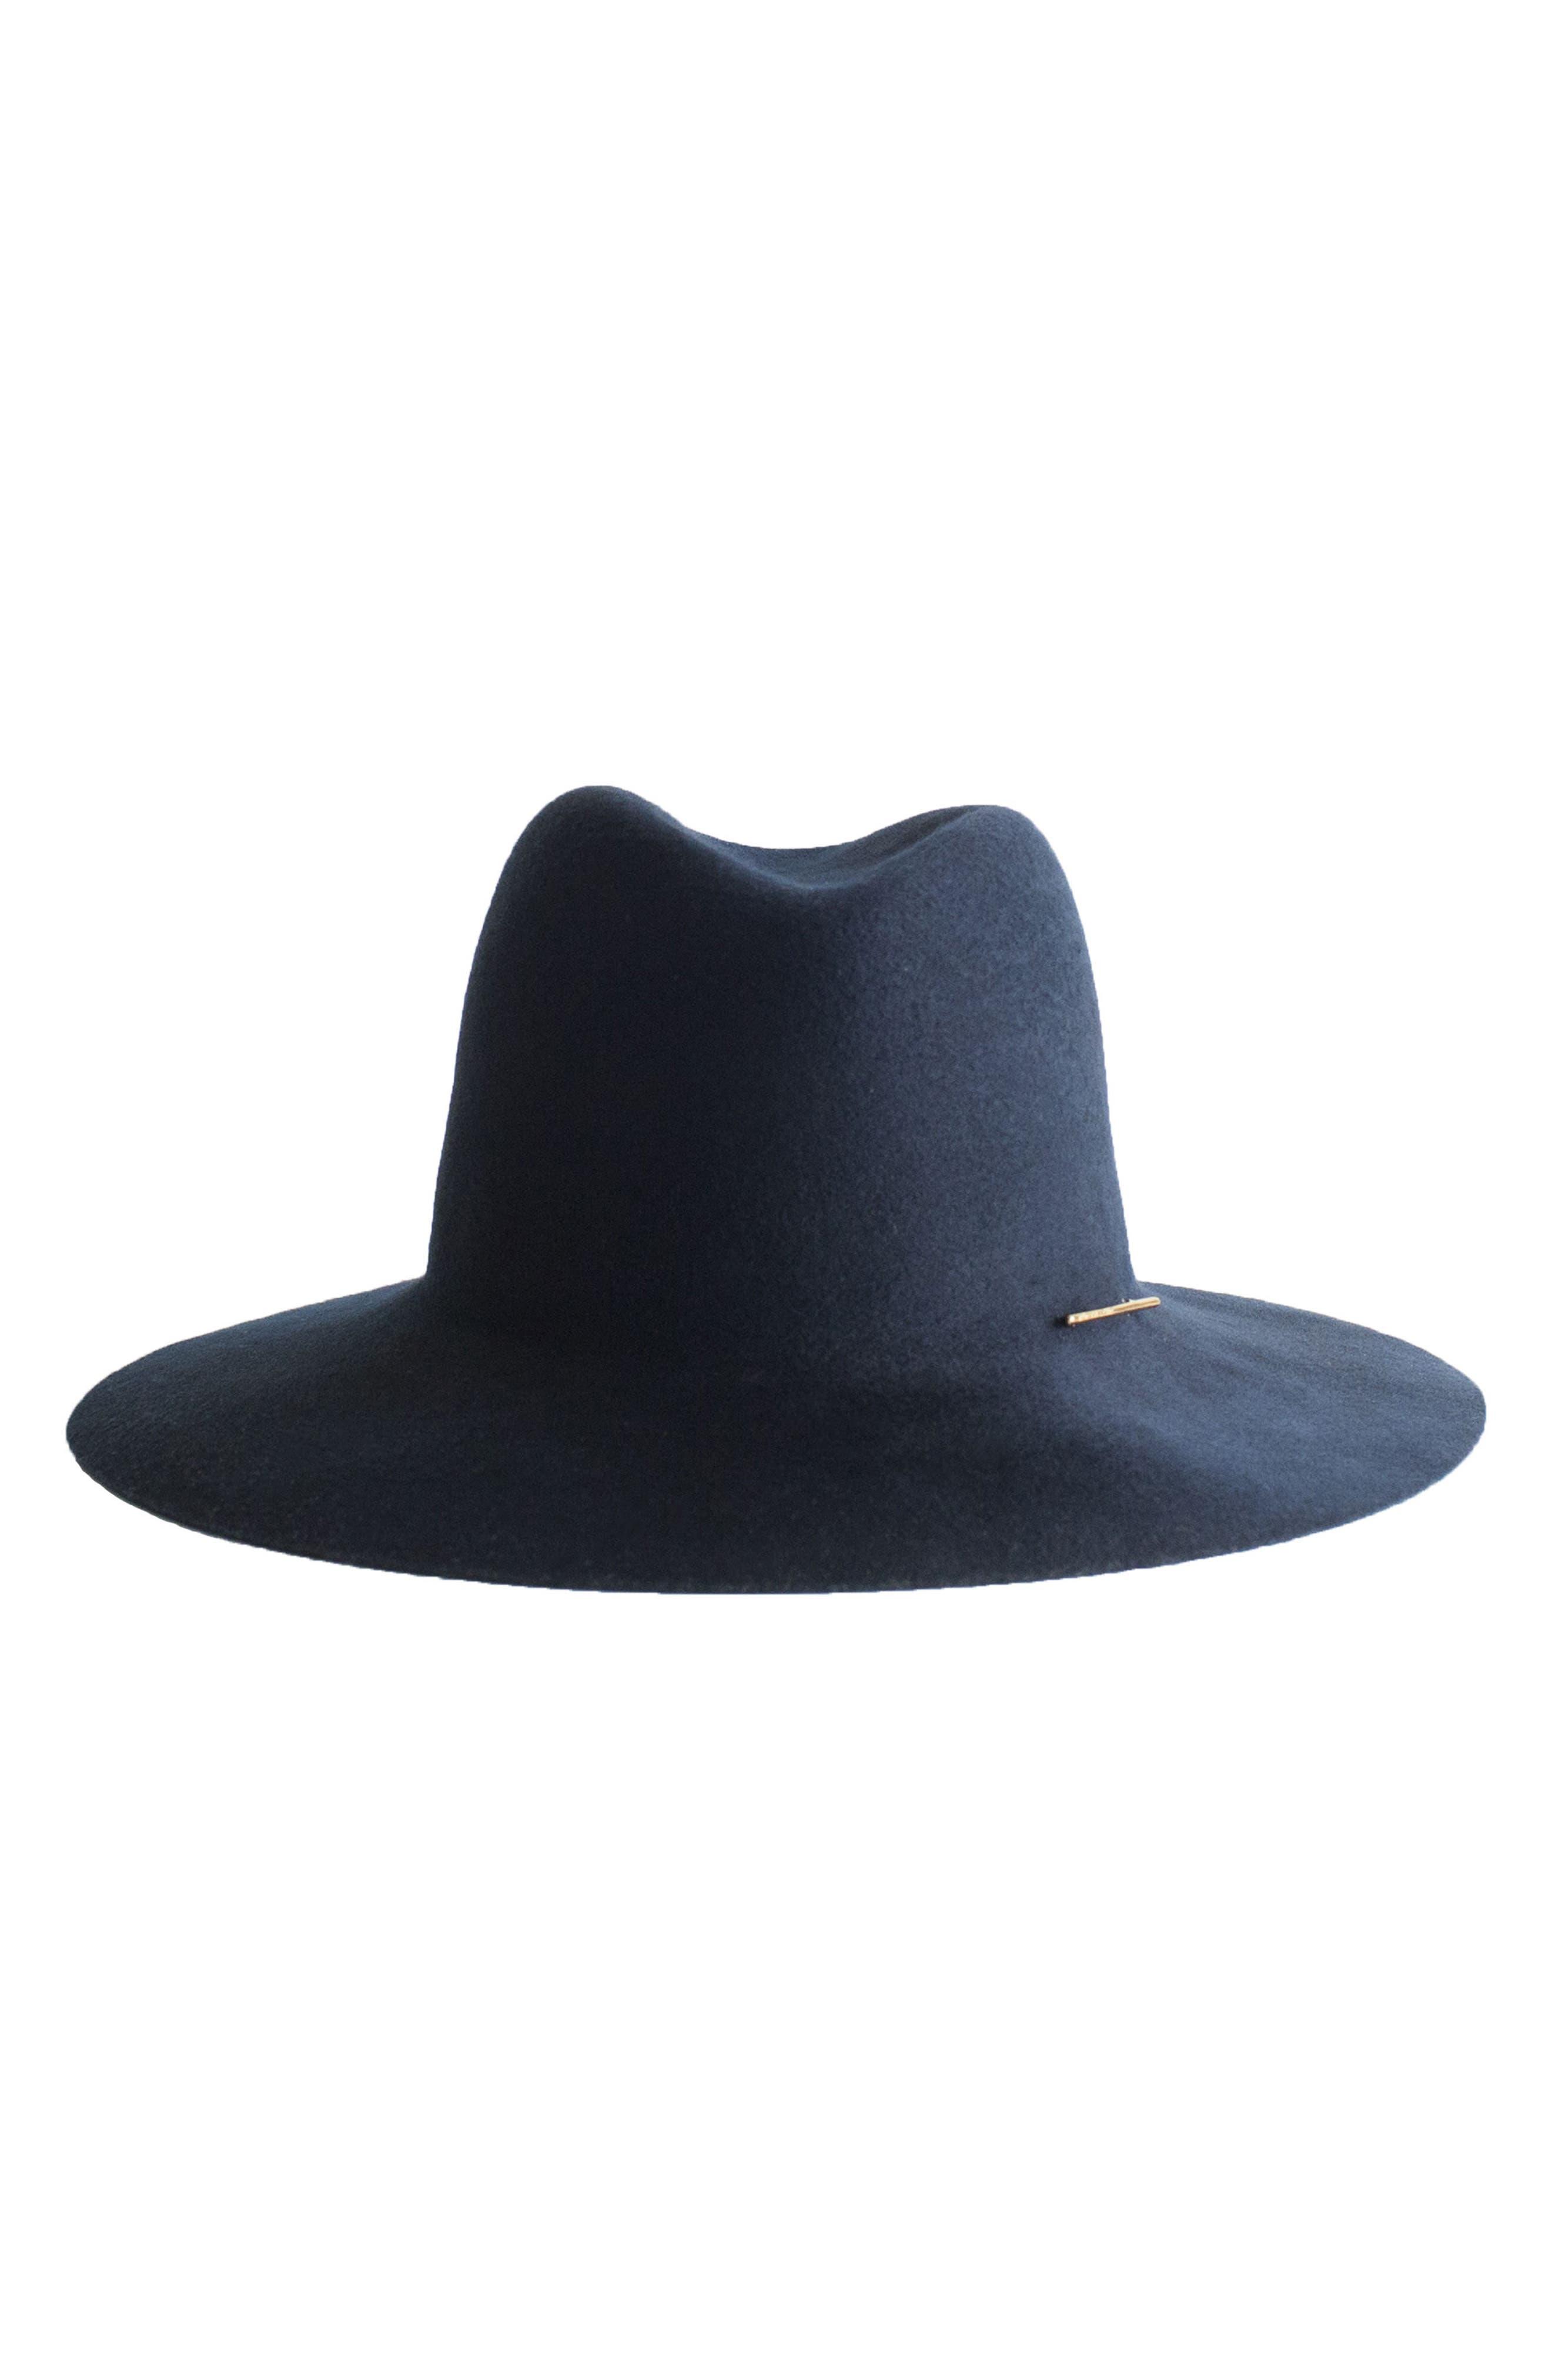 Taylor Wool Hat,                             Alternate thumbnail 2, color,                             Cadet Blue